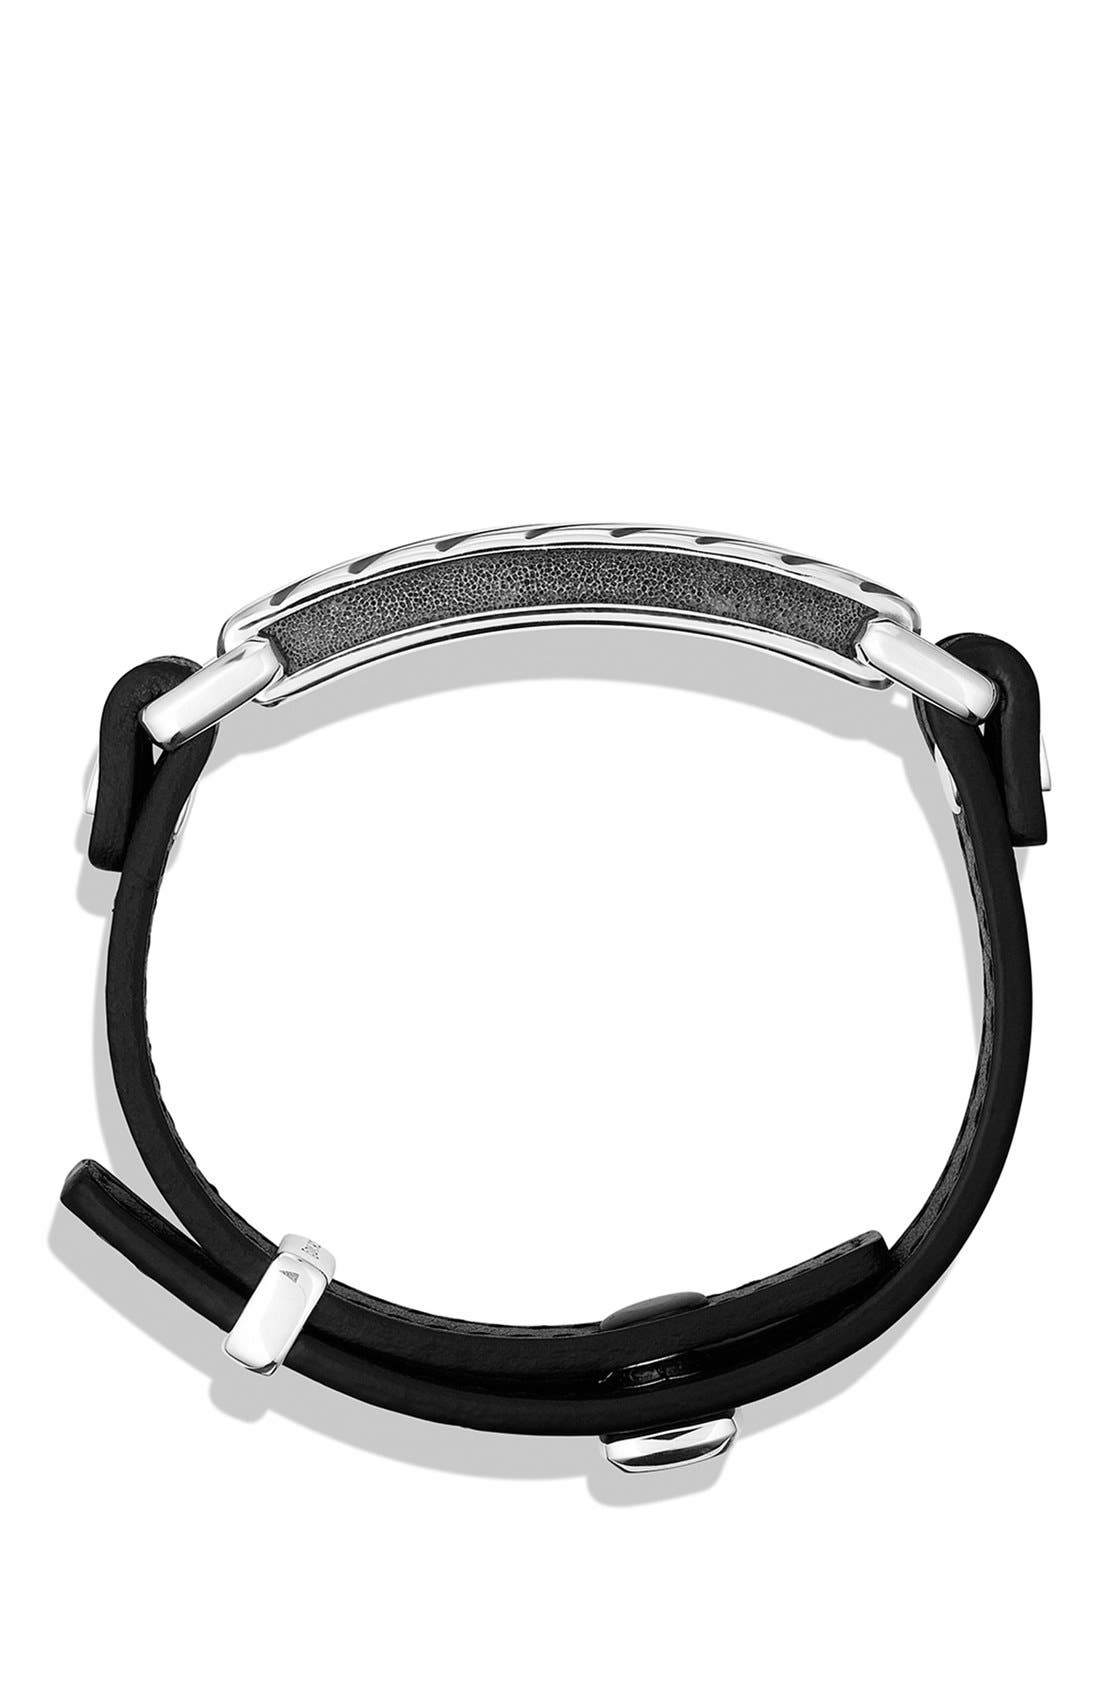 Modern Cable ID Bracelet,                             Alternate thumbnail 3, color,                             BLACK